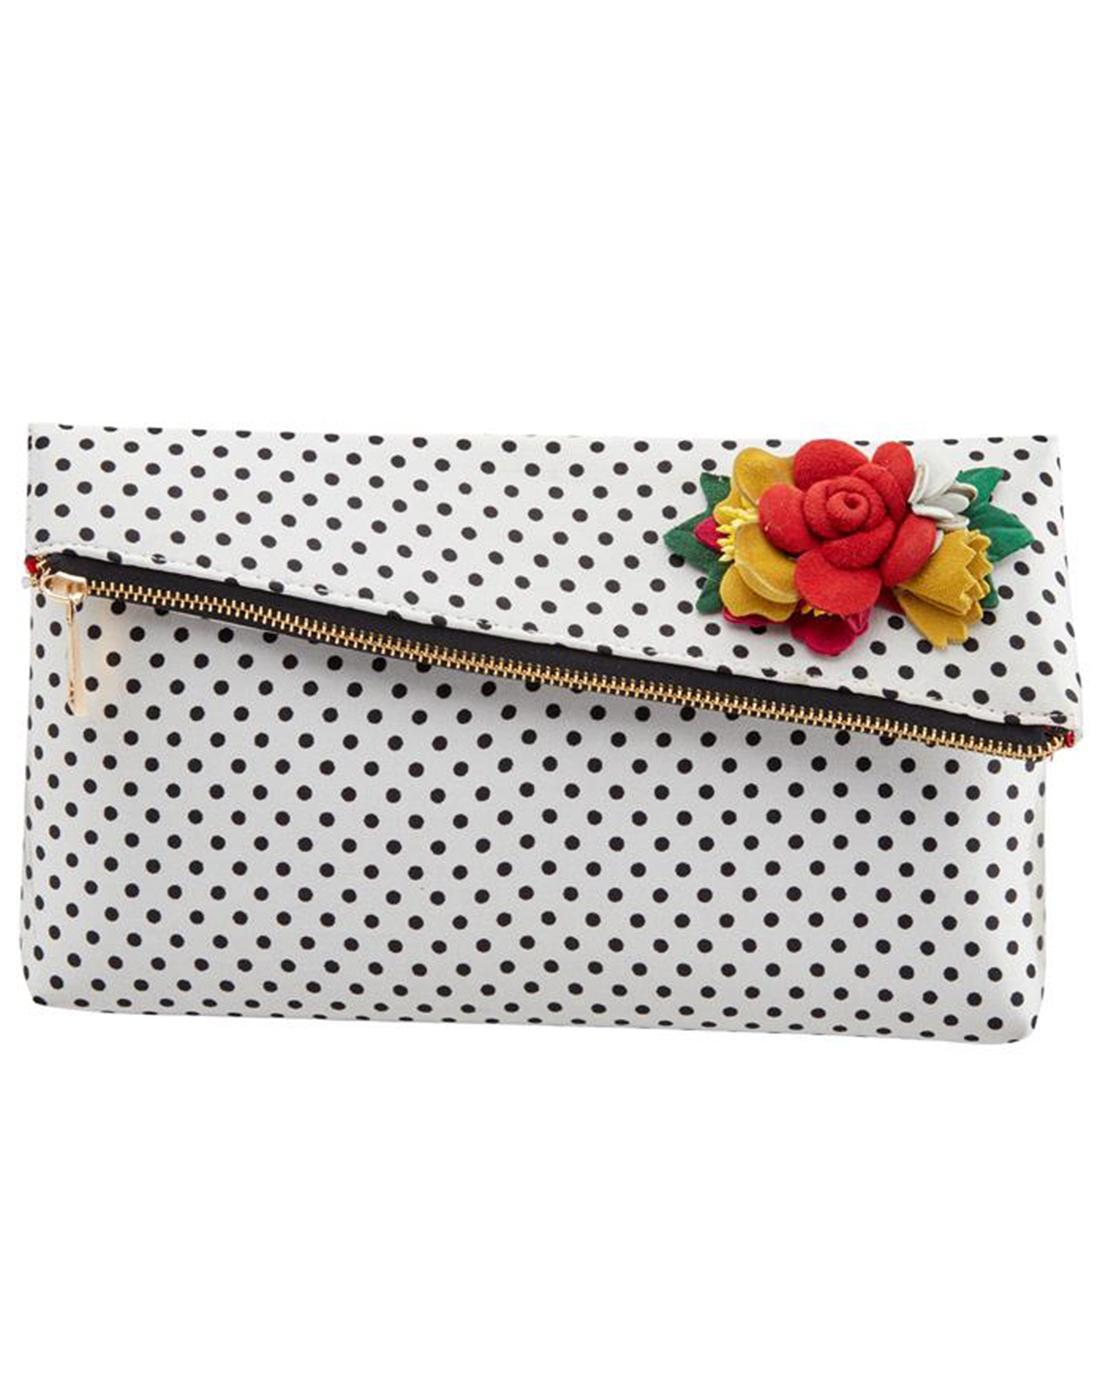 Meryl Bag JOE BROWNS Vintage Polkadot Clutch Bag